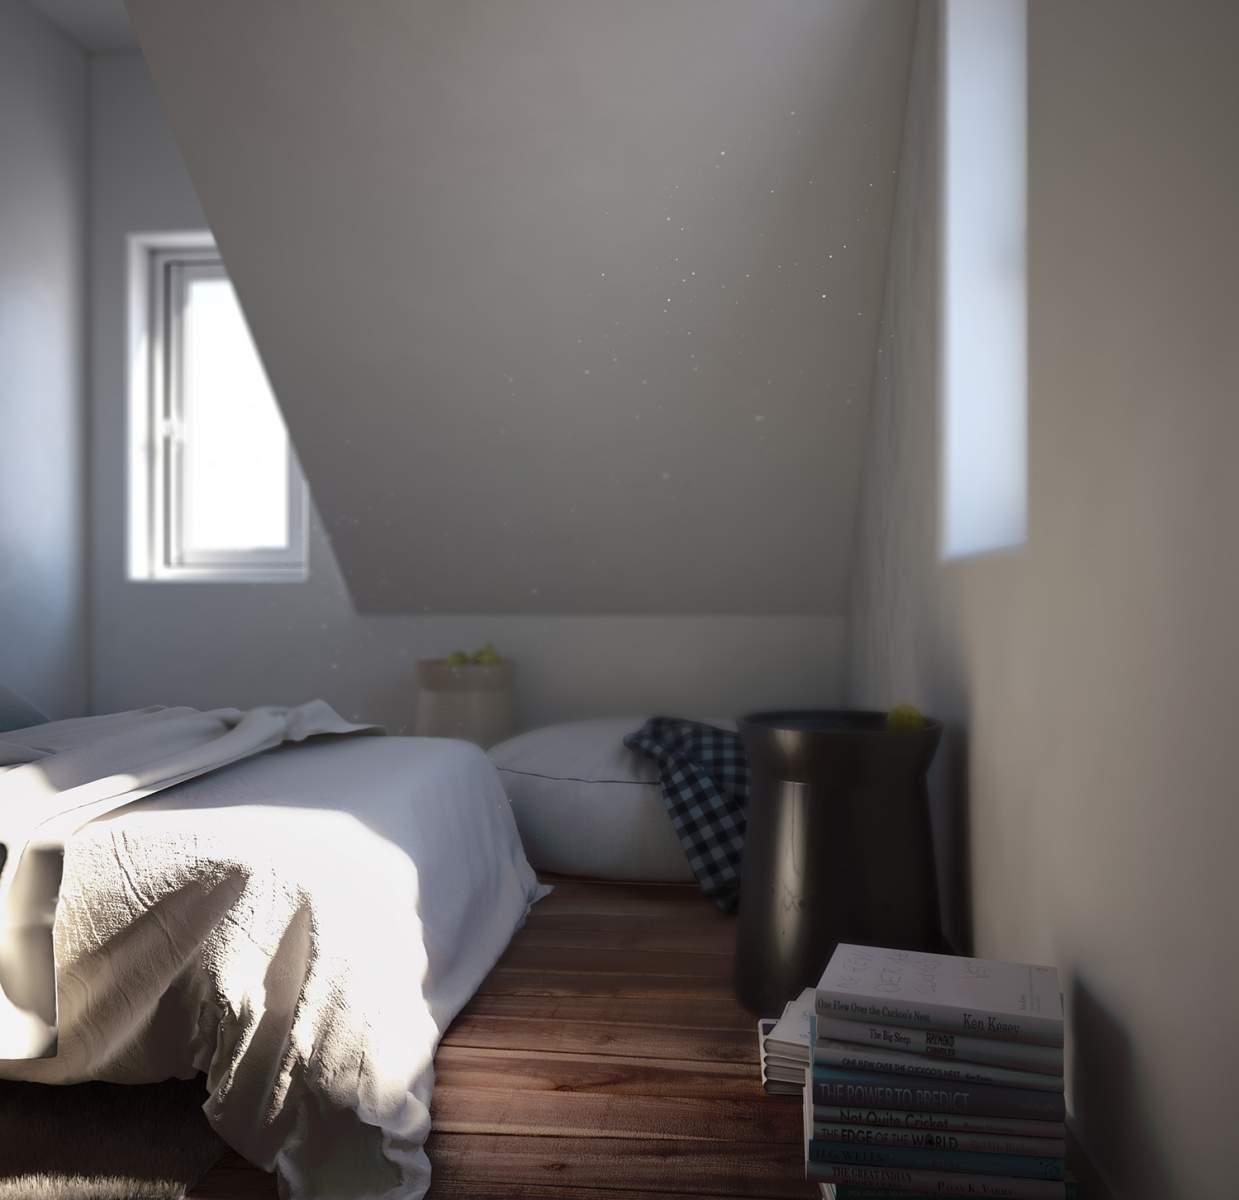 Chambre sous les toits #2